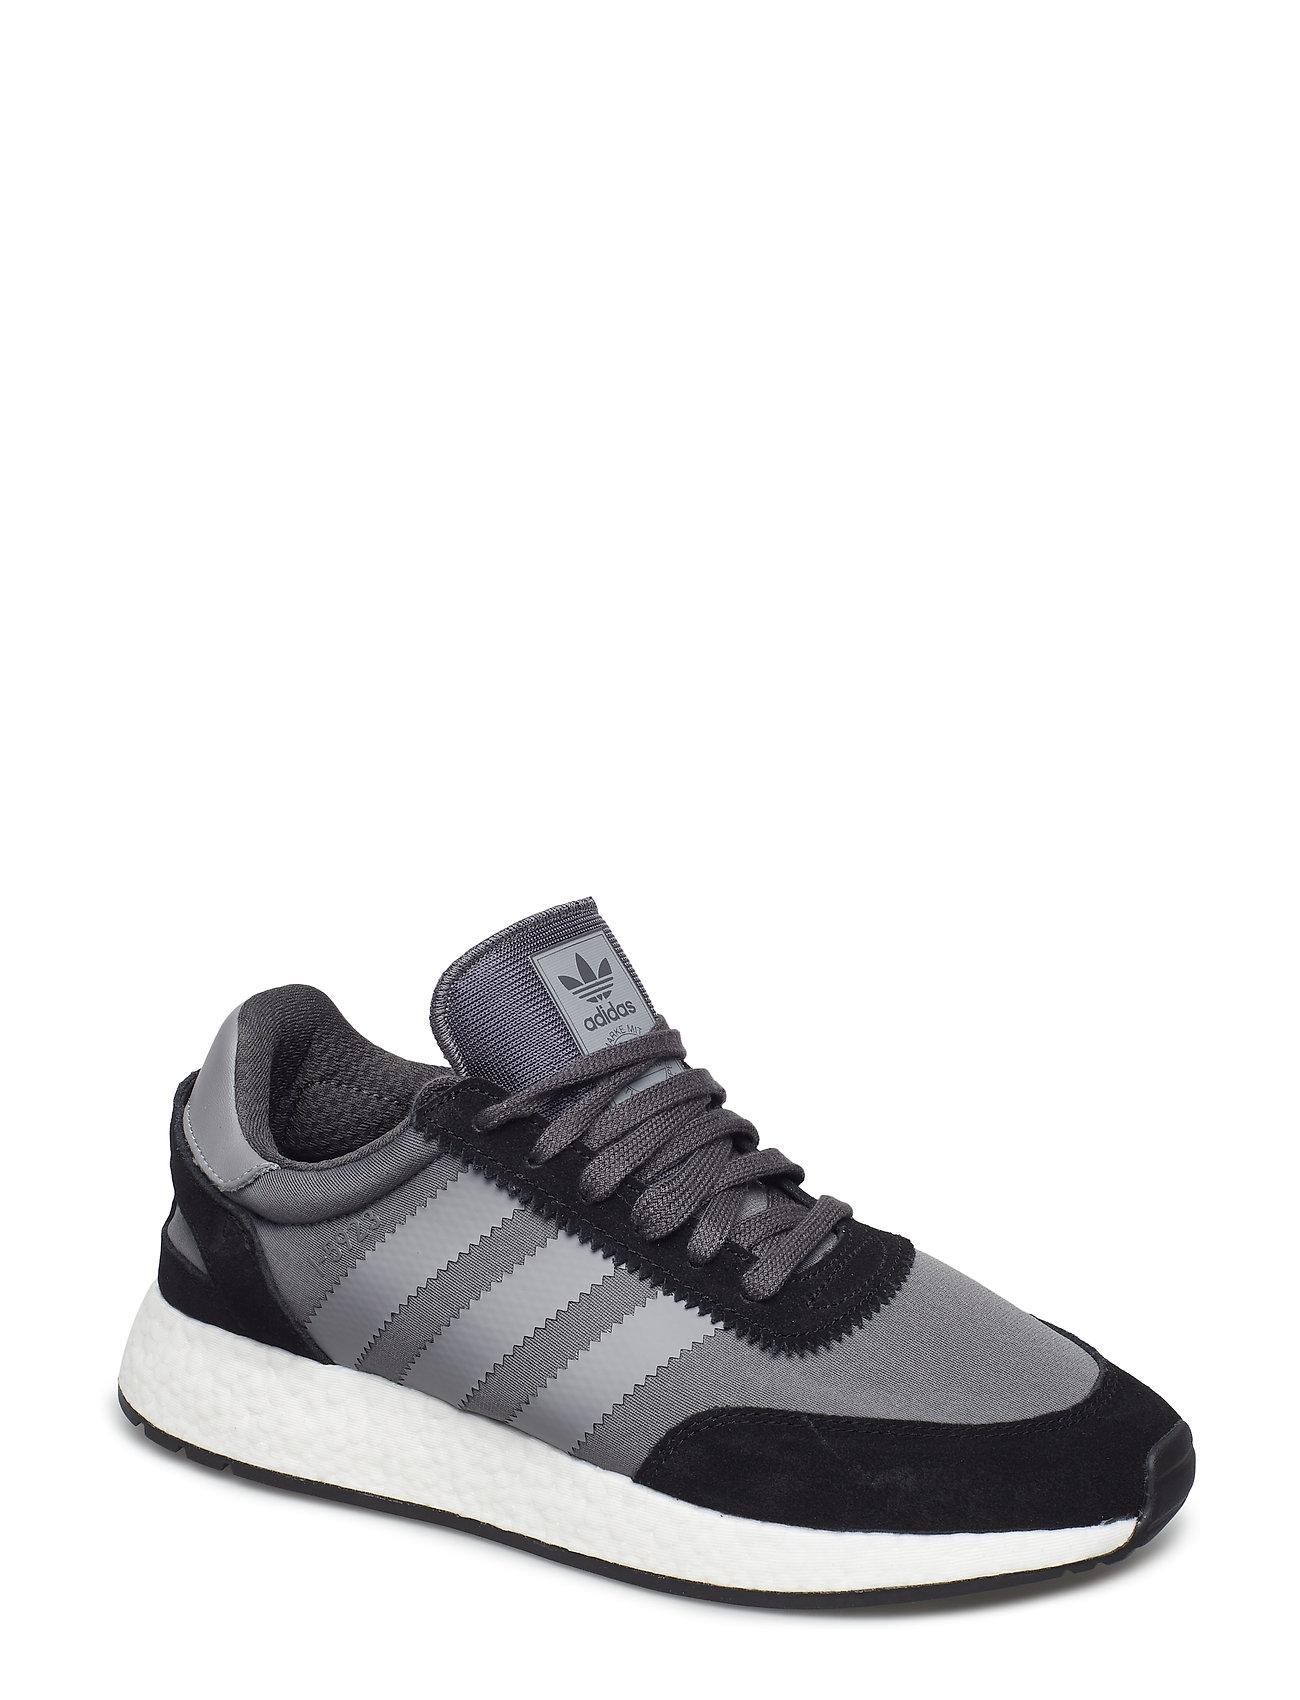 adidas Originals I 5923 W CBLACKGRETHRGREFIV Sneakers Ny